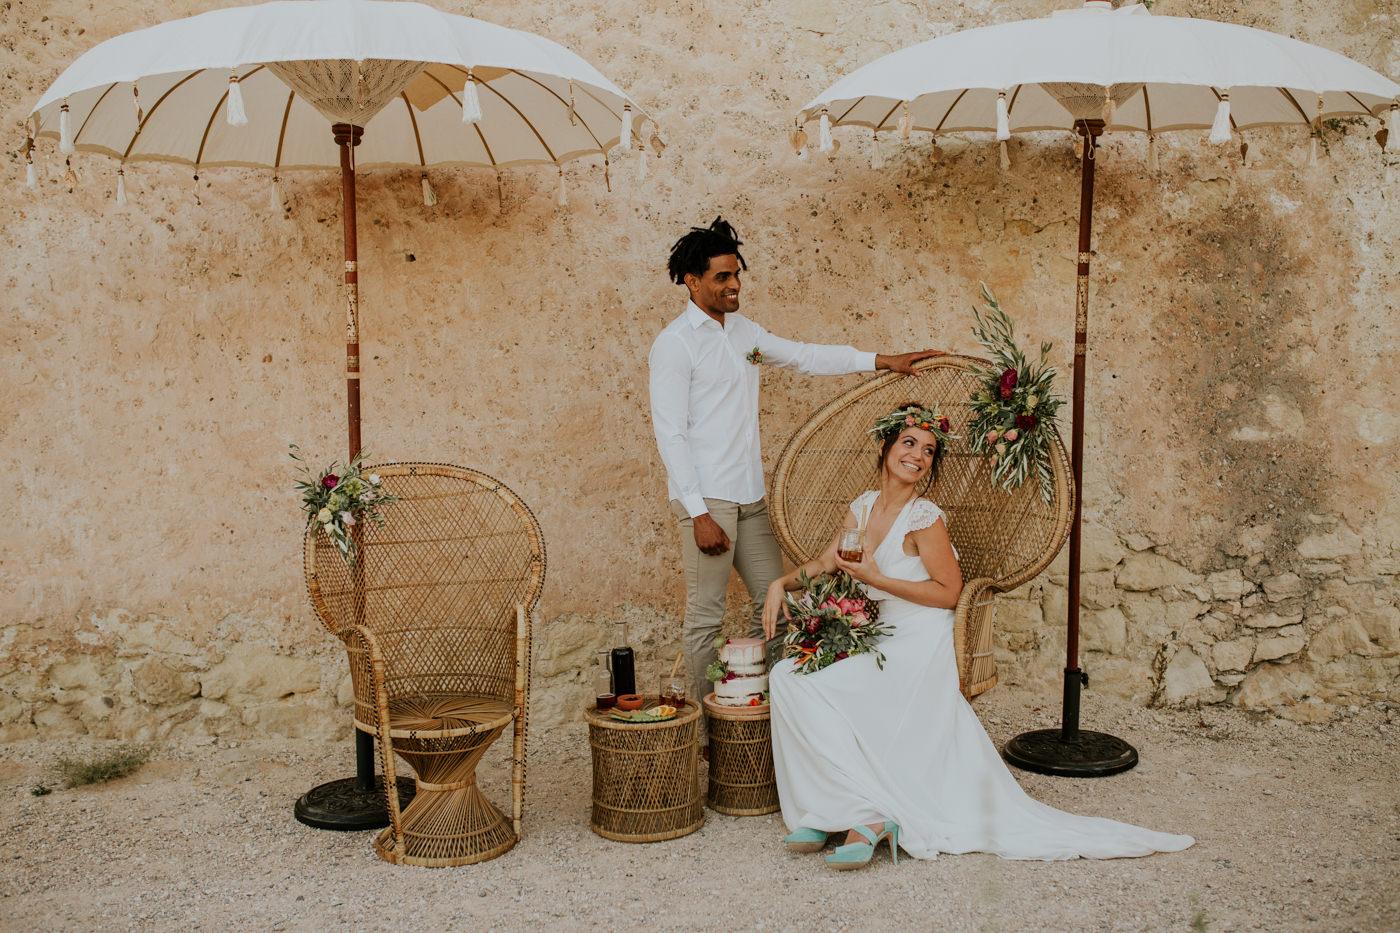 fotografo-boda-alicante-wedding-planner-aloha_estudio_mia_dreamer-0091